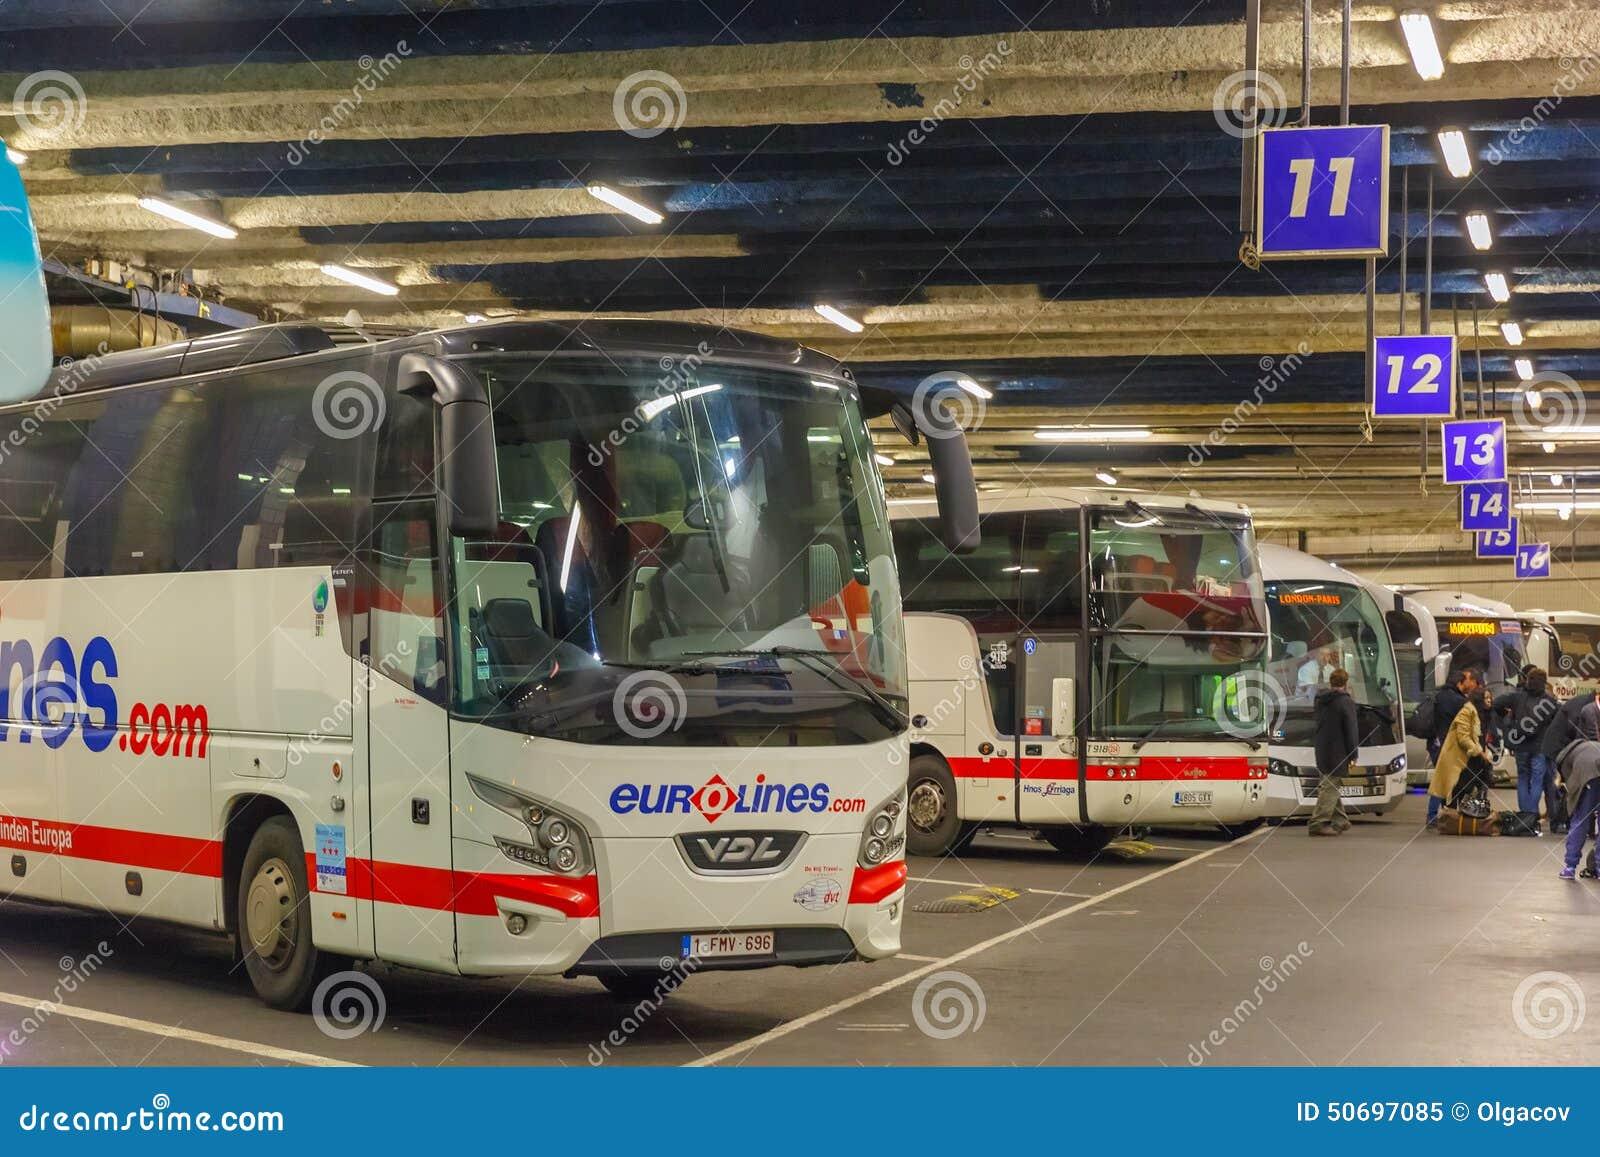 coach station eurolines paris gallieni porte editorial image image 50697085. Black Bedroom Furniture Sets. Home Design Ideas